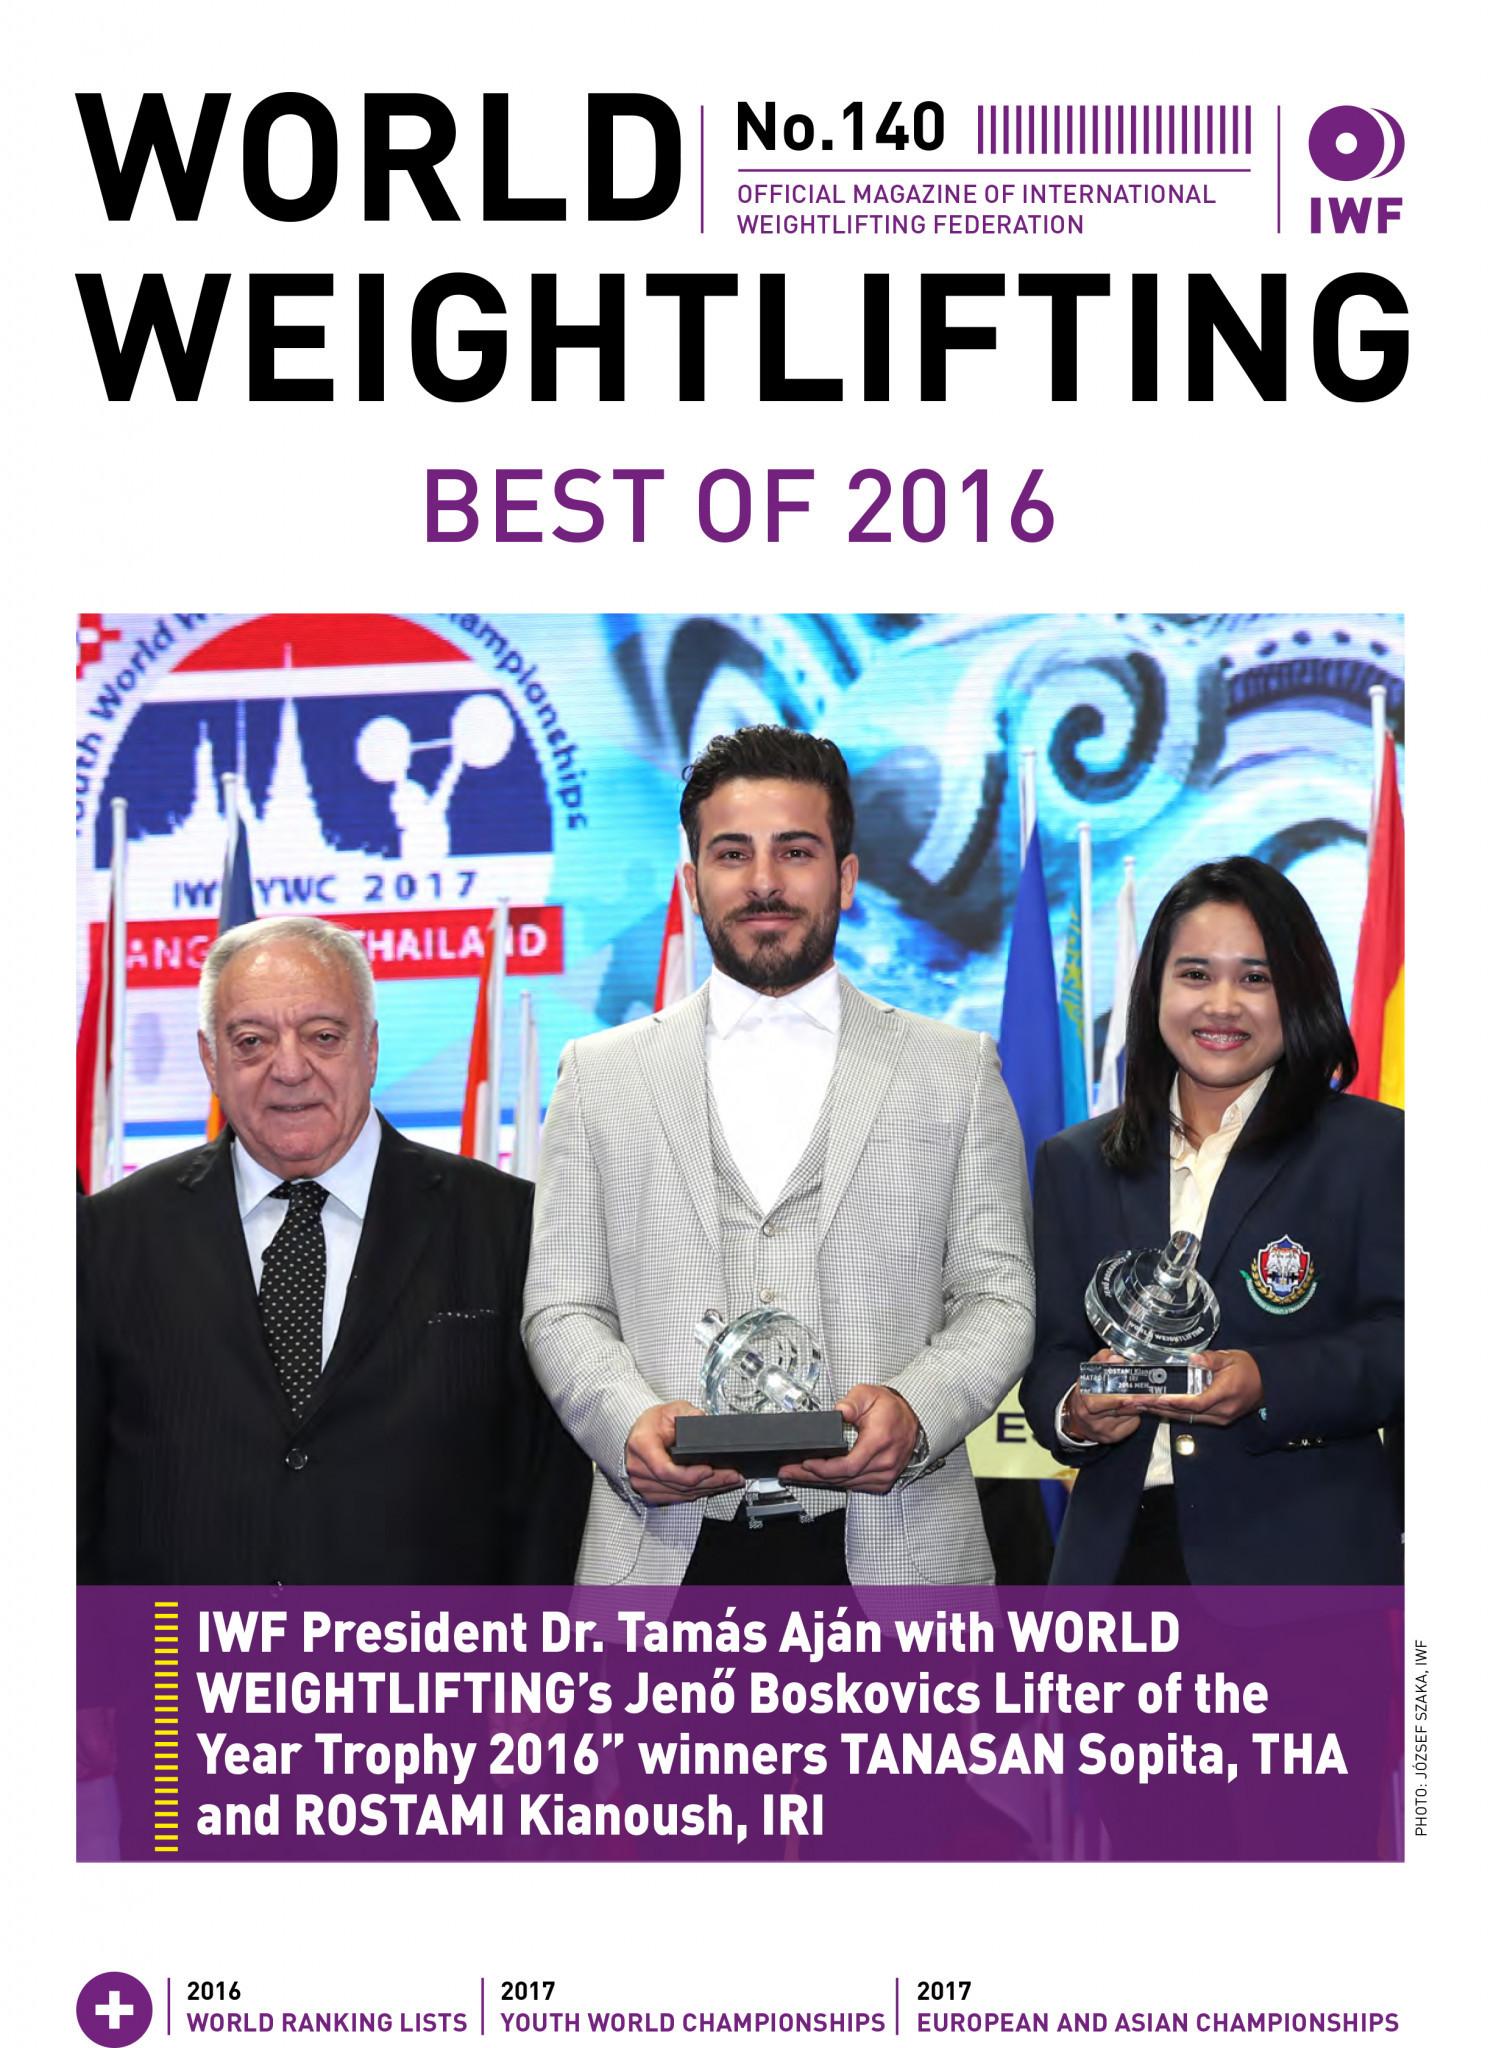 World Weightlifting Magazine No. 140